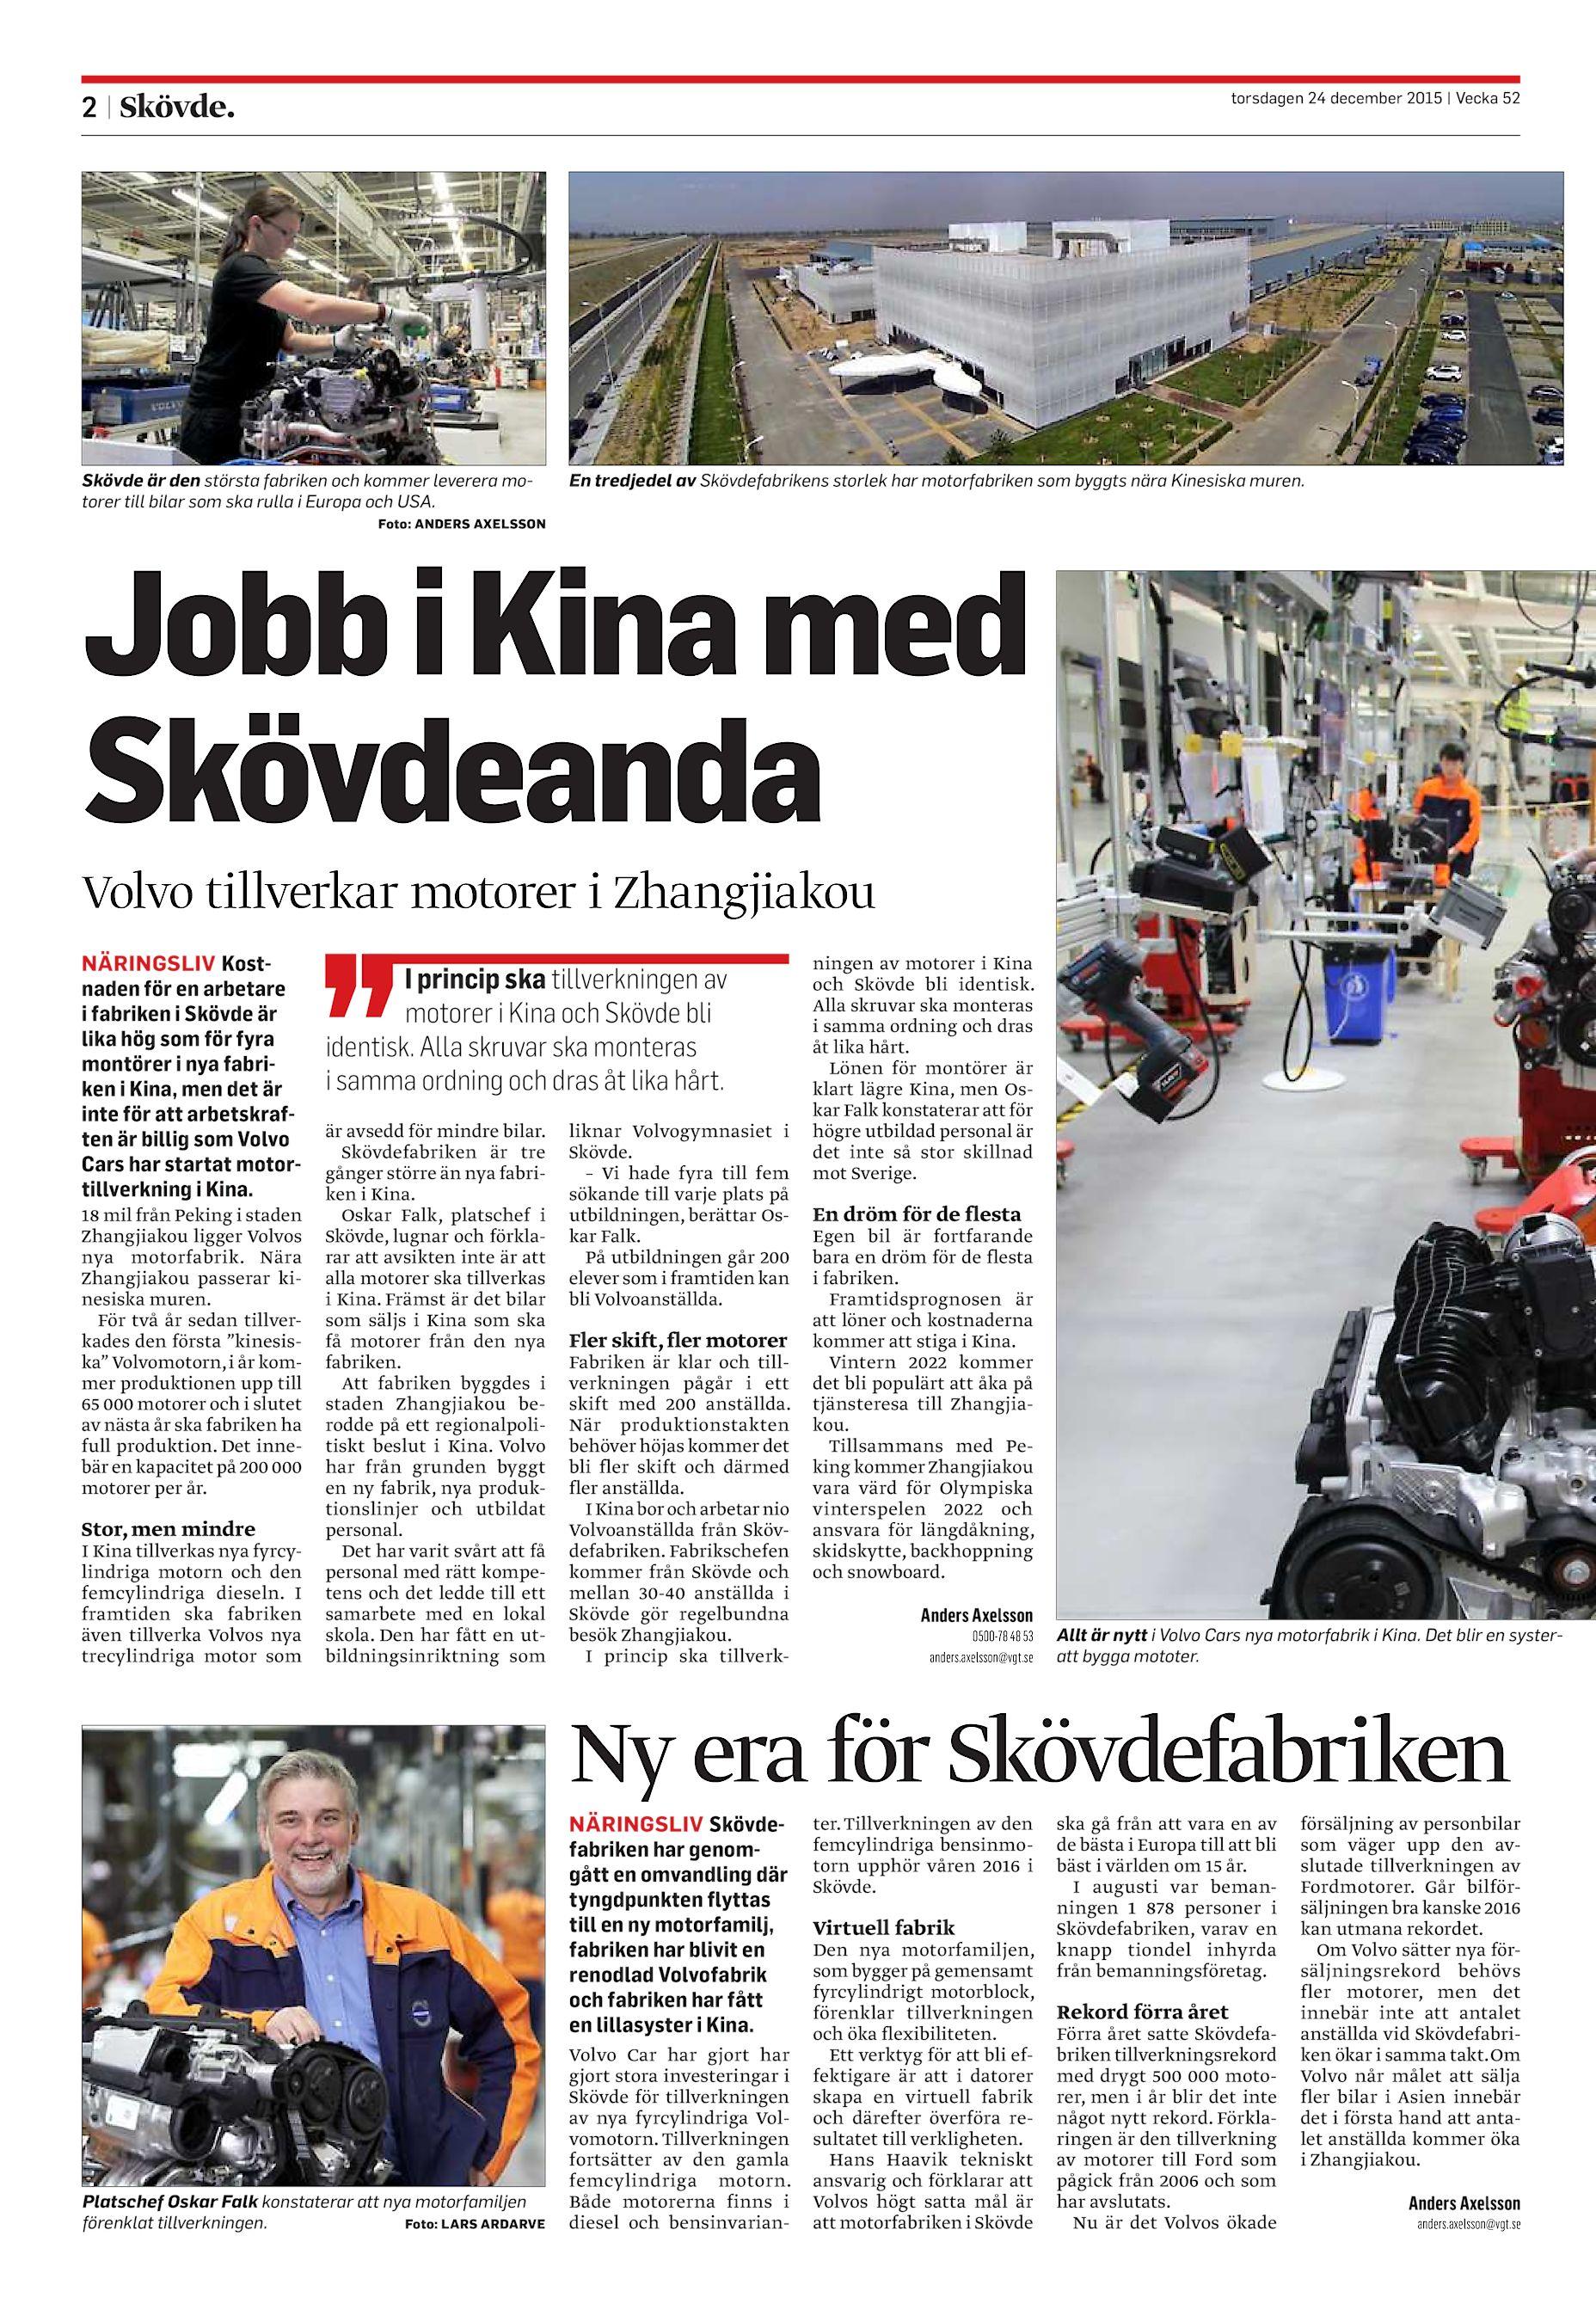 Skövde Nyheter SN-20151224 (endast text) 0d38e6f32d46f